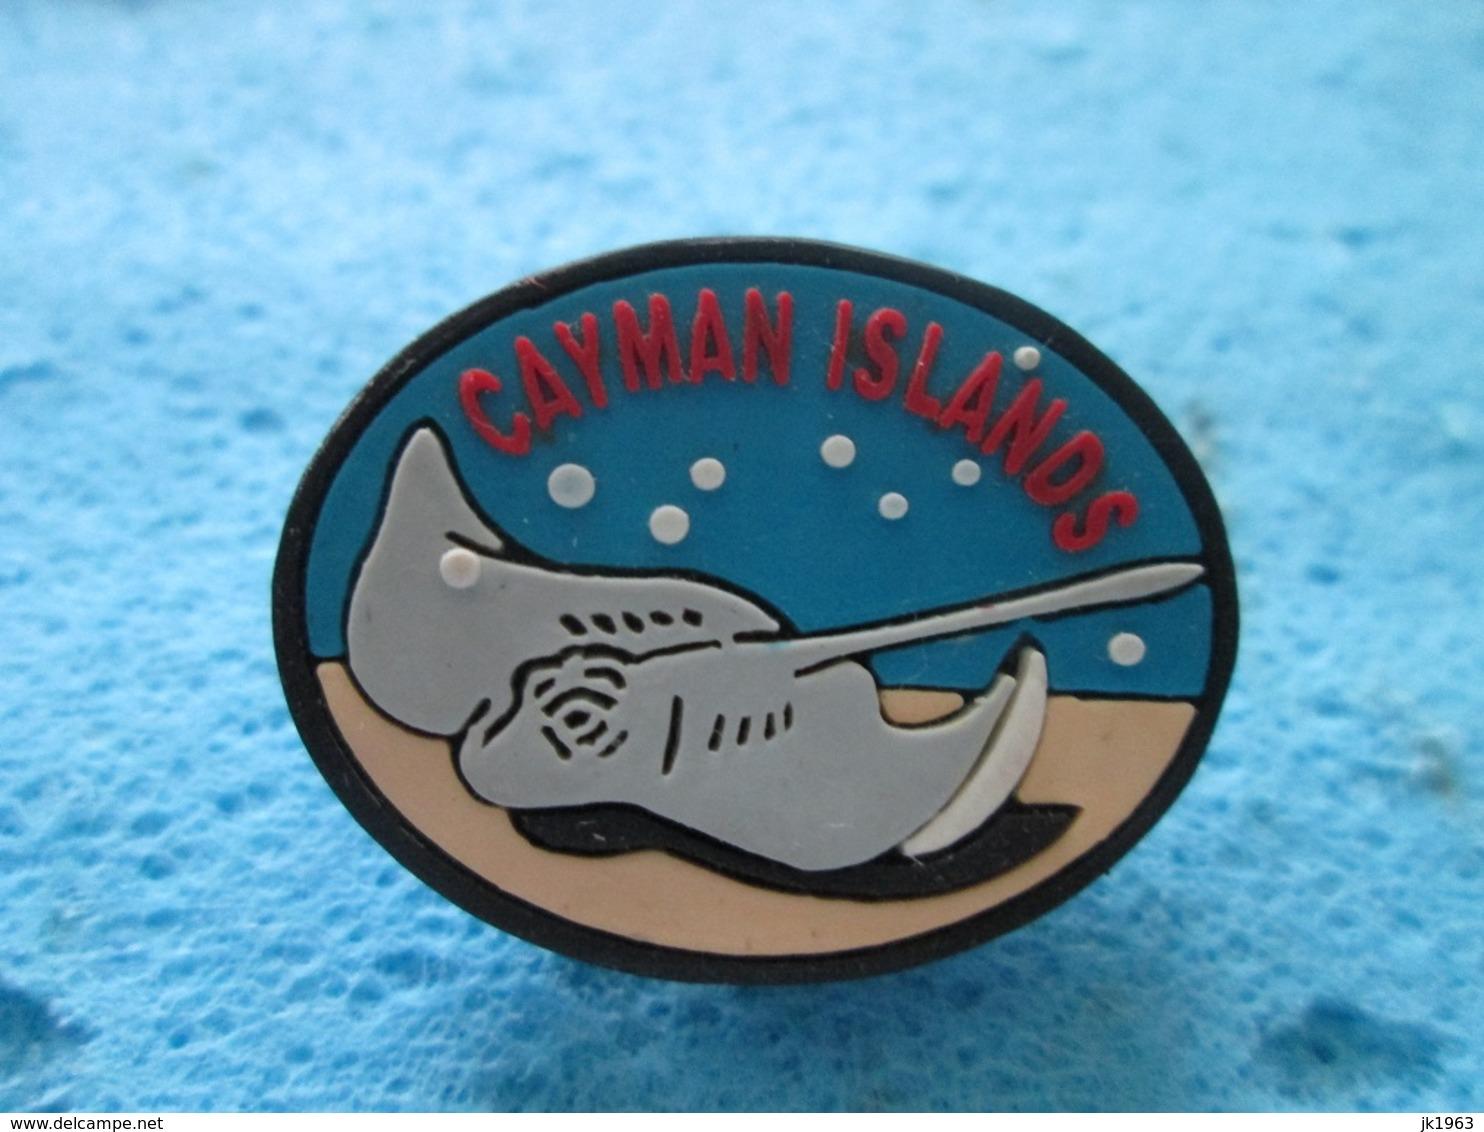 STINGRAY FISH, CAYMAN ISLANDS BADGES - Lots